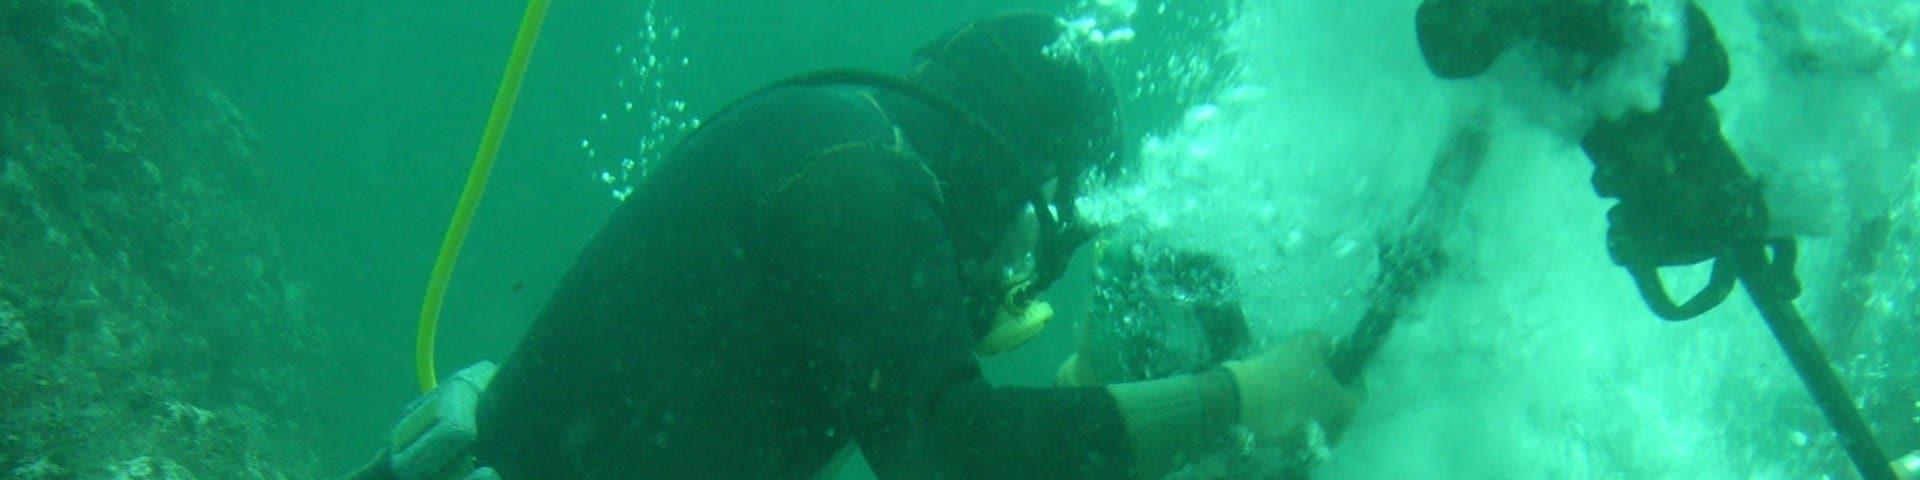 perforaciones-submarinas